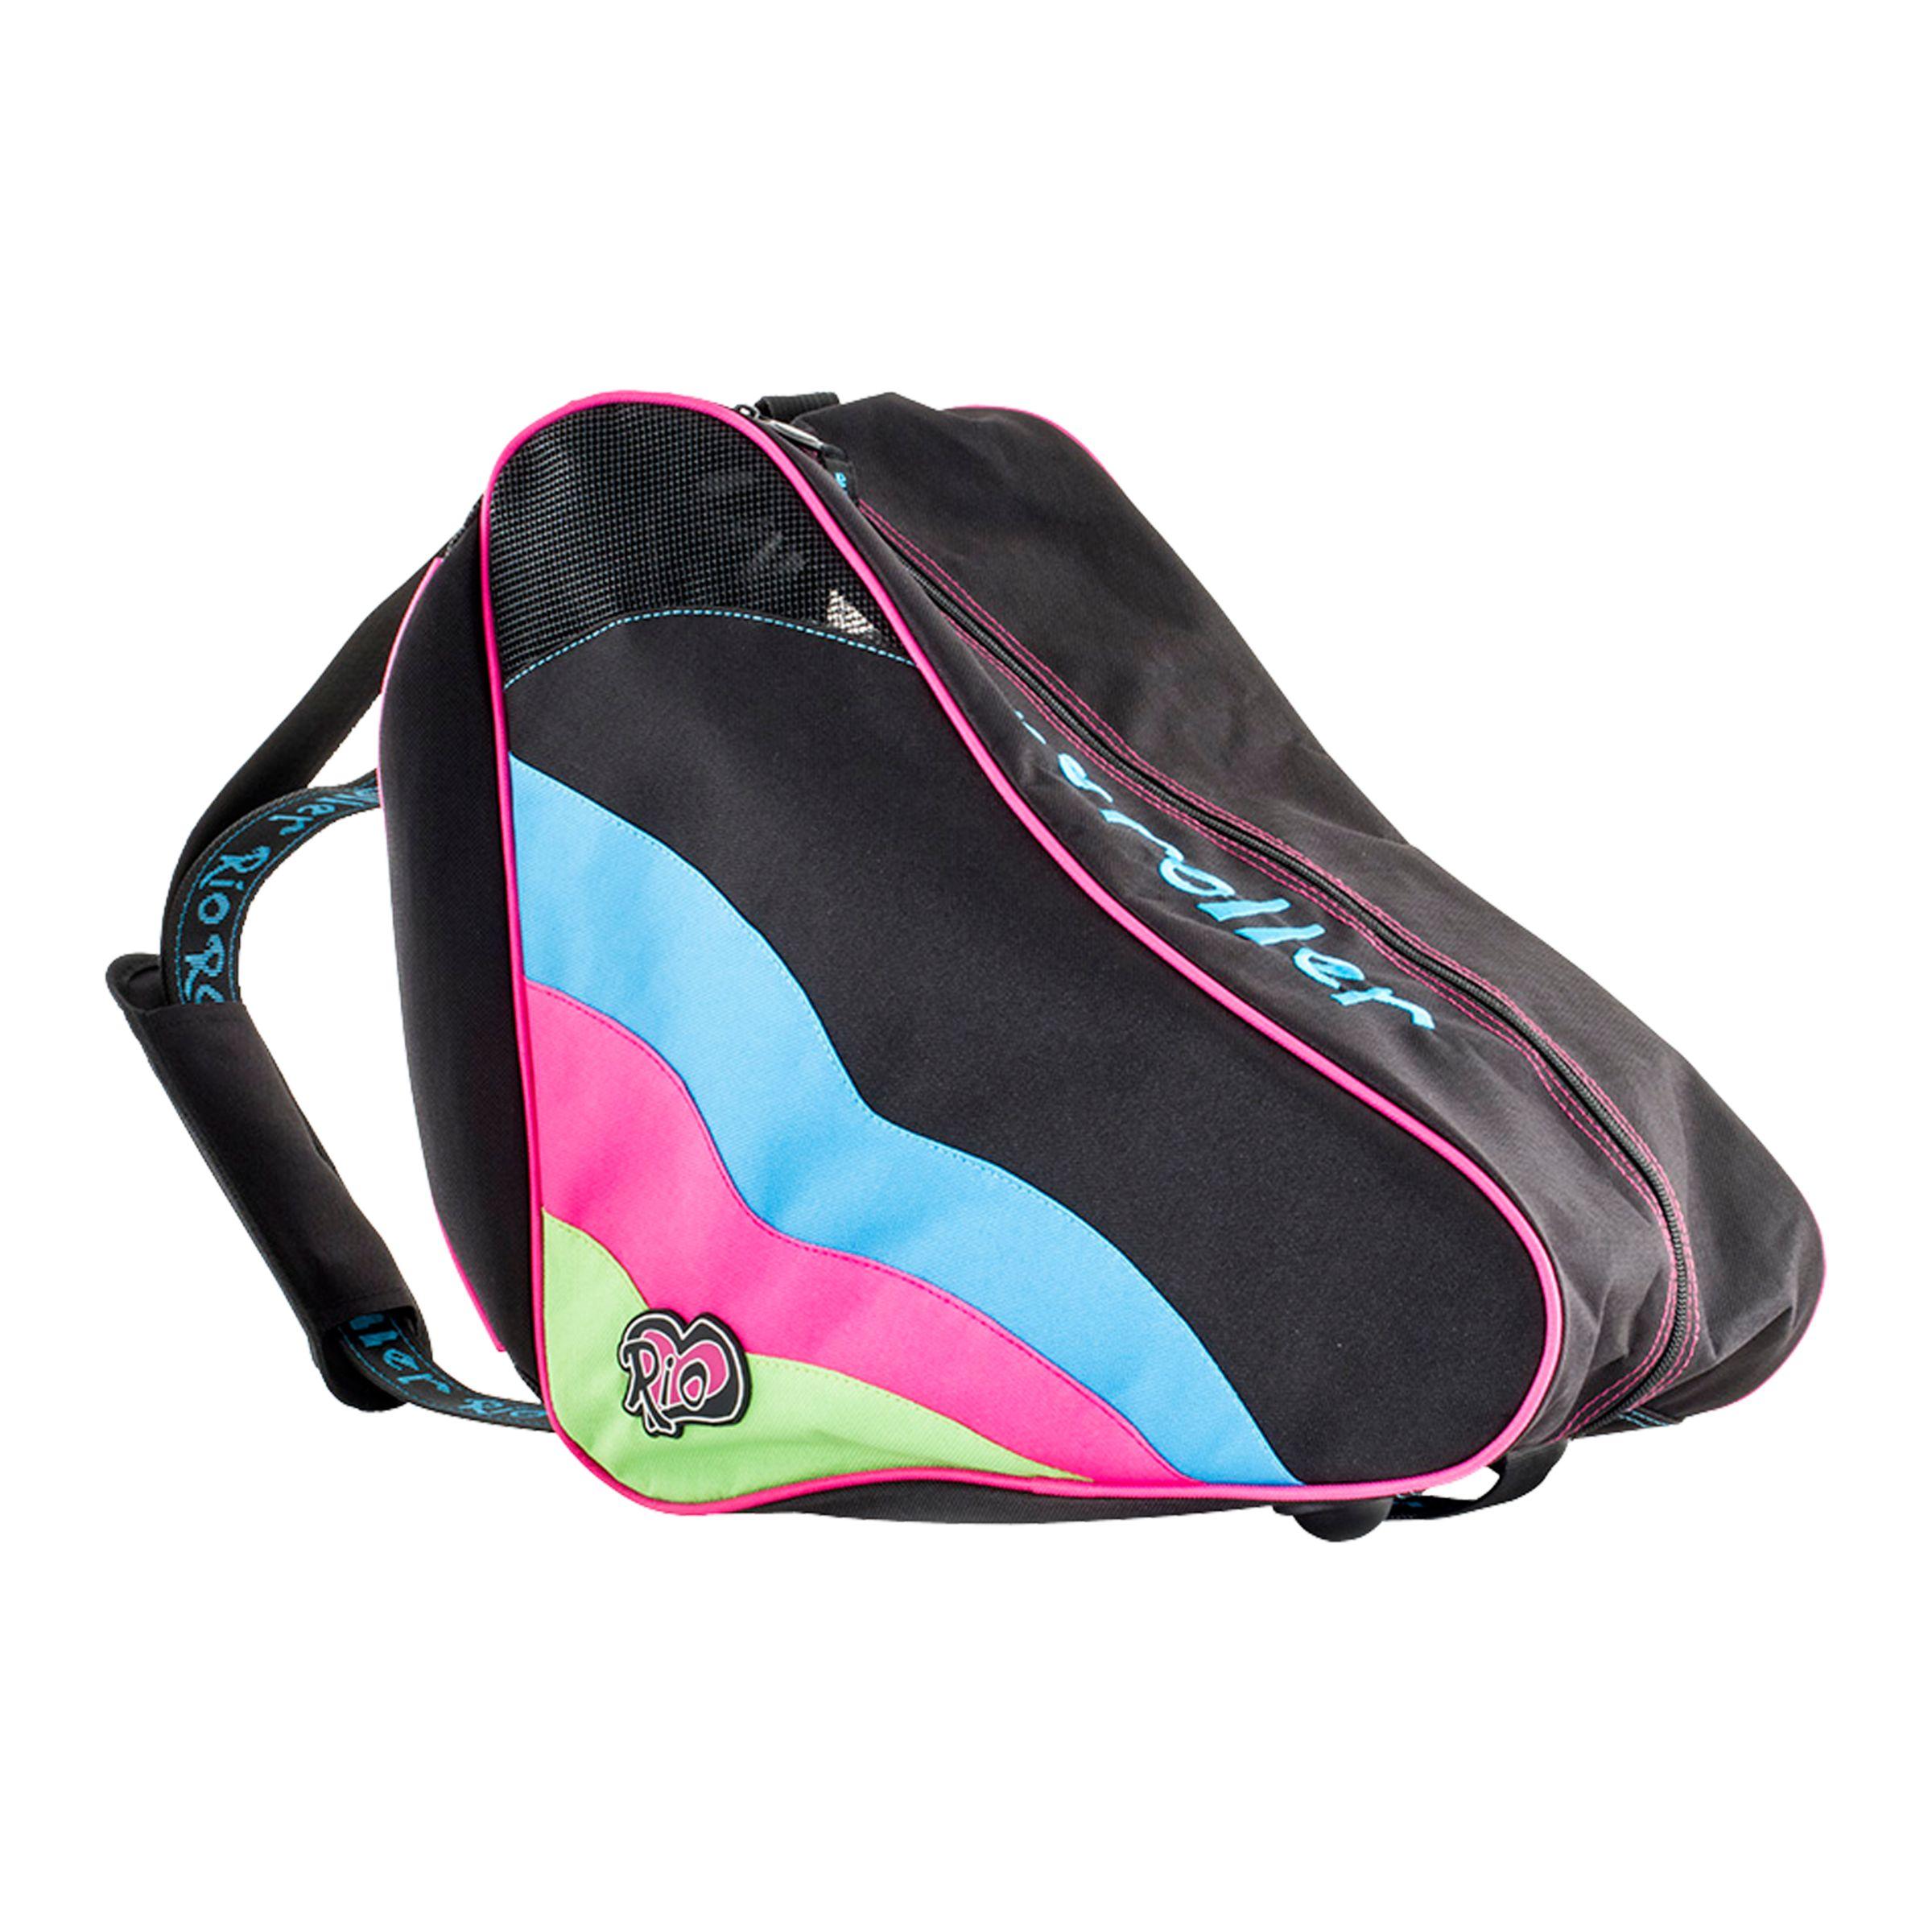 Rio Roller Rio Roller Passion Skate Bag, Black